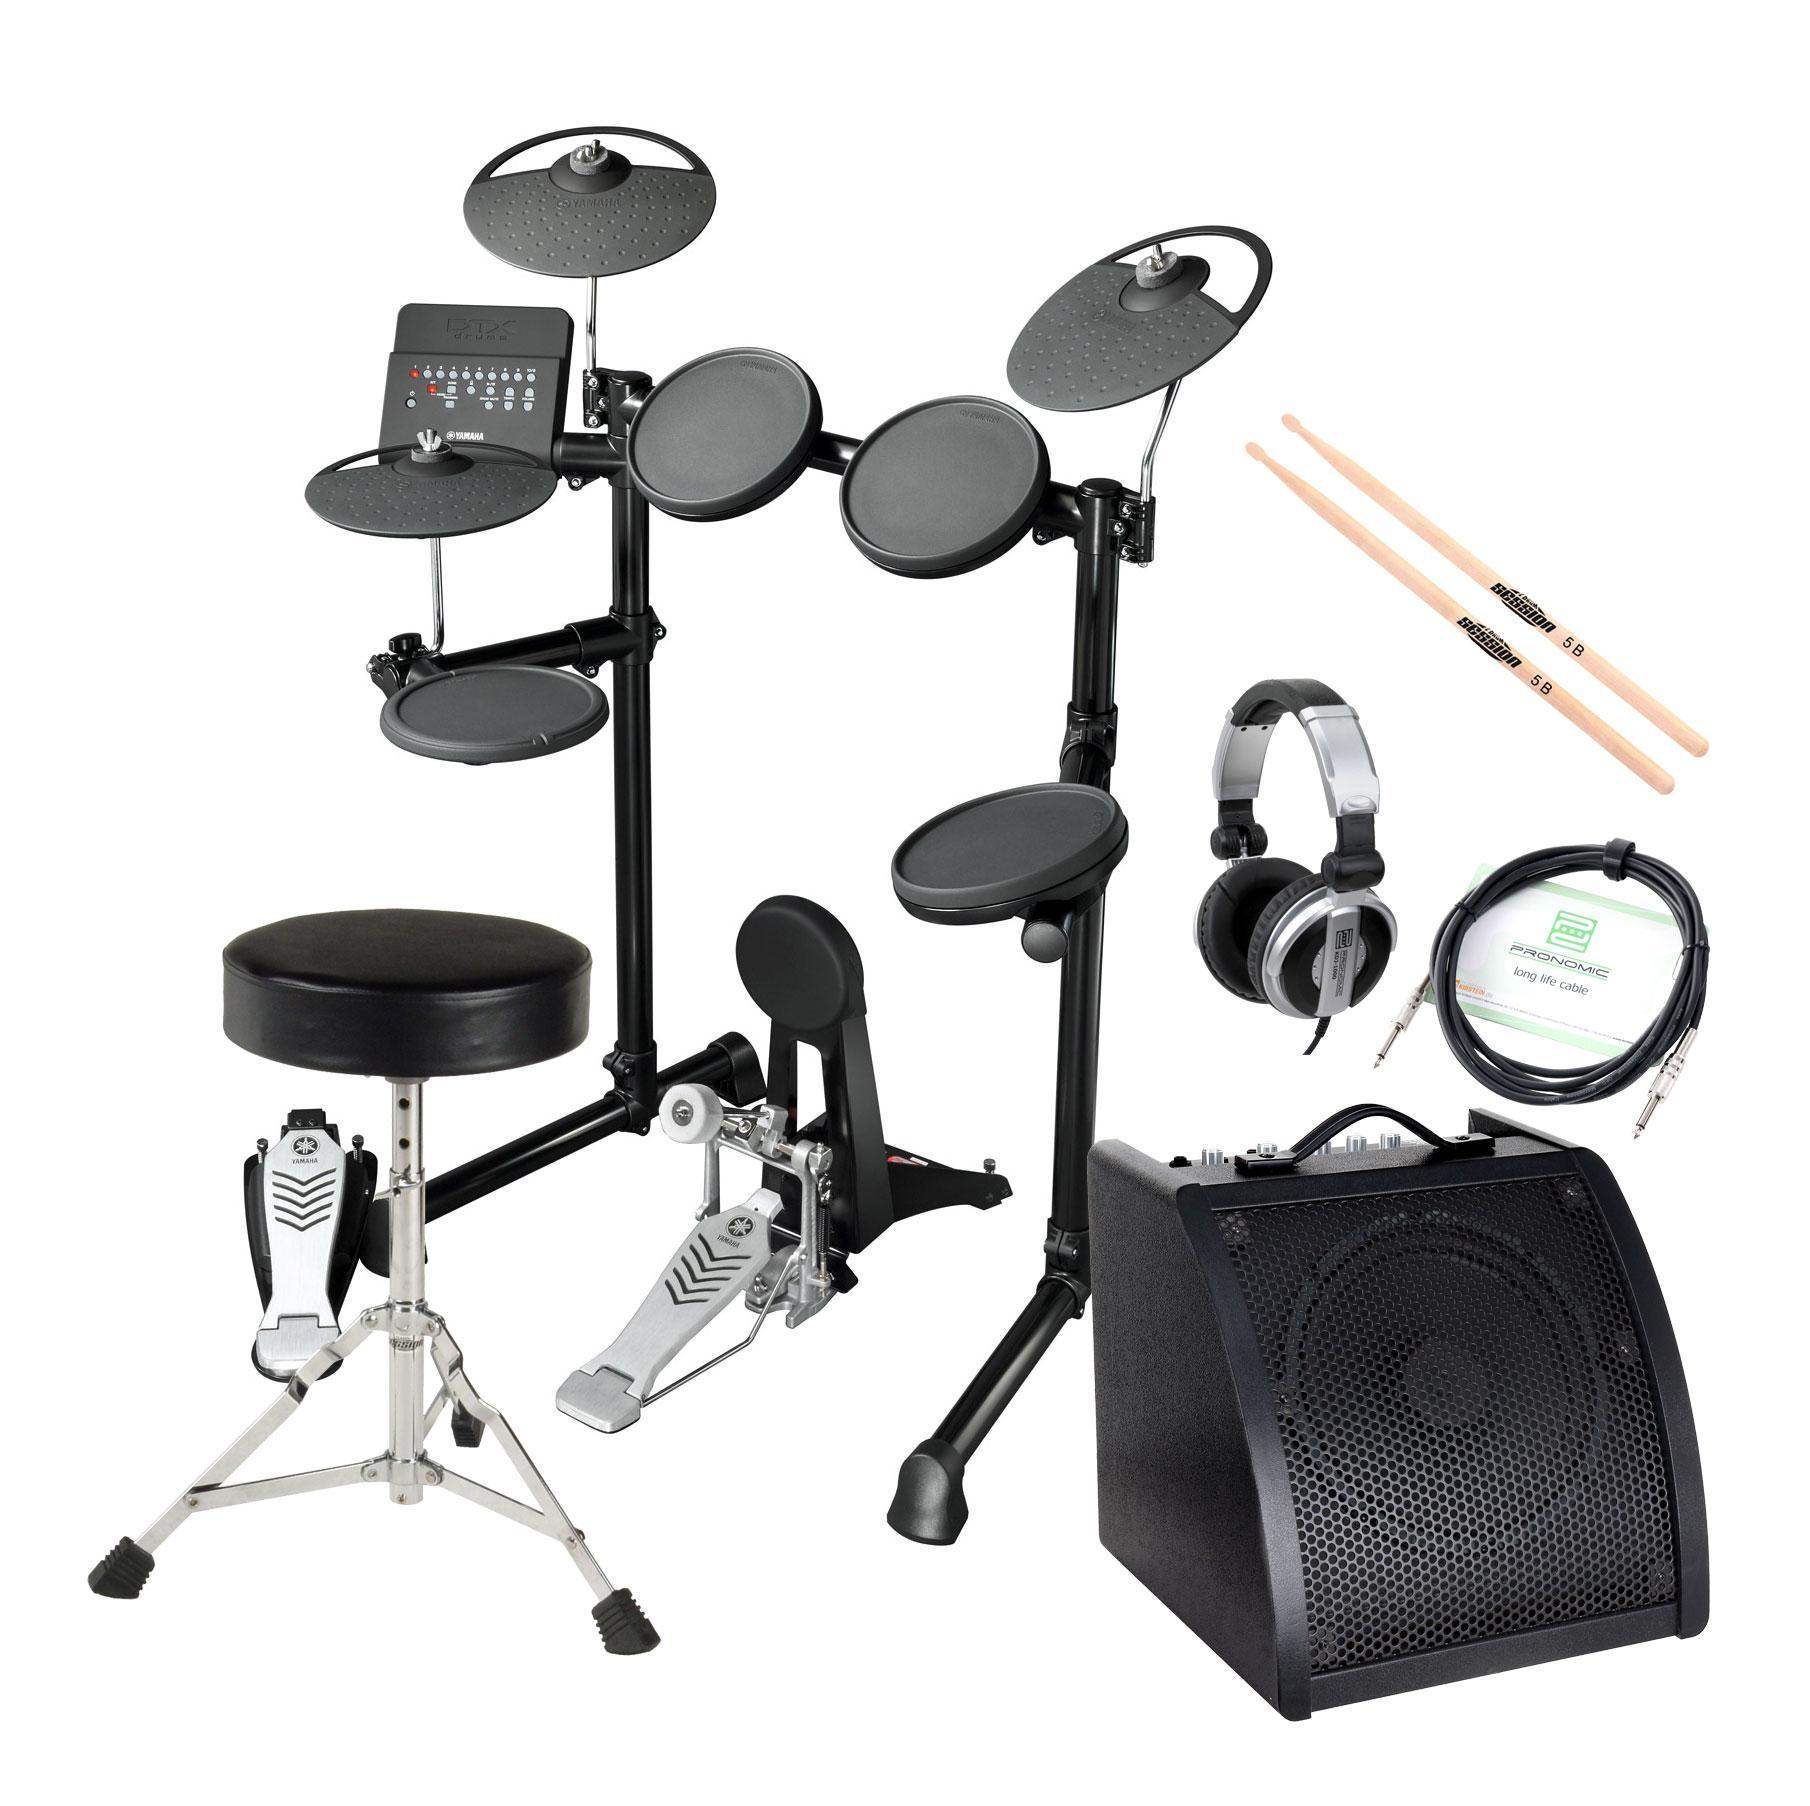 Yamaha DTX450K Compact E Drum Kit SET inkl. Verstärker Kopfhörer Drumhocker Sticks